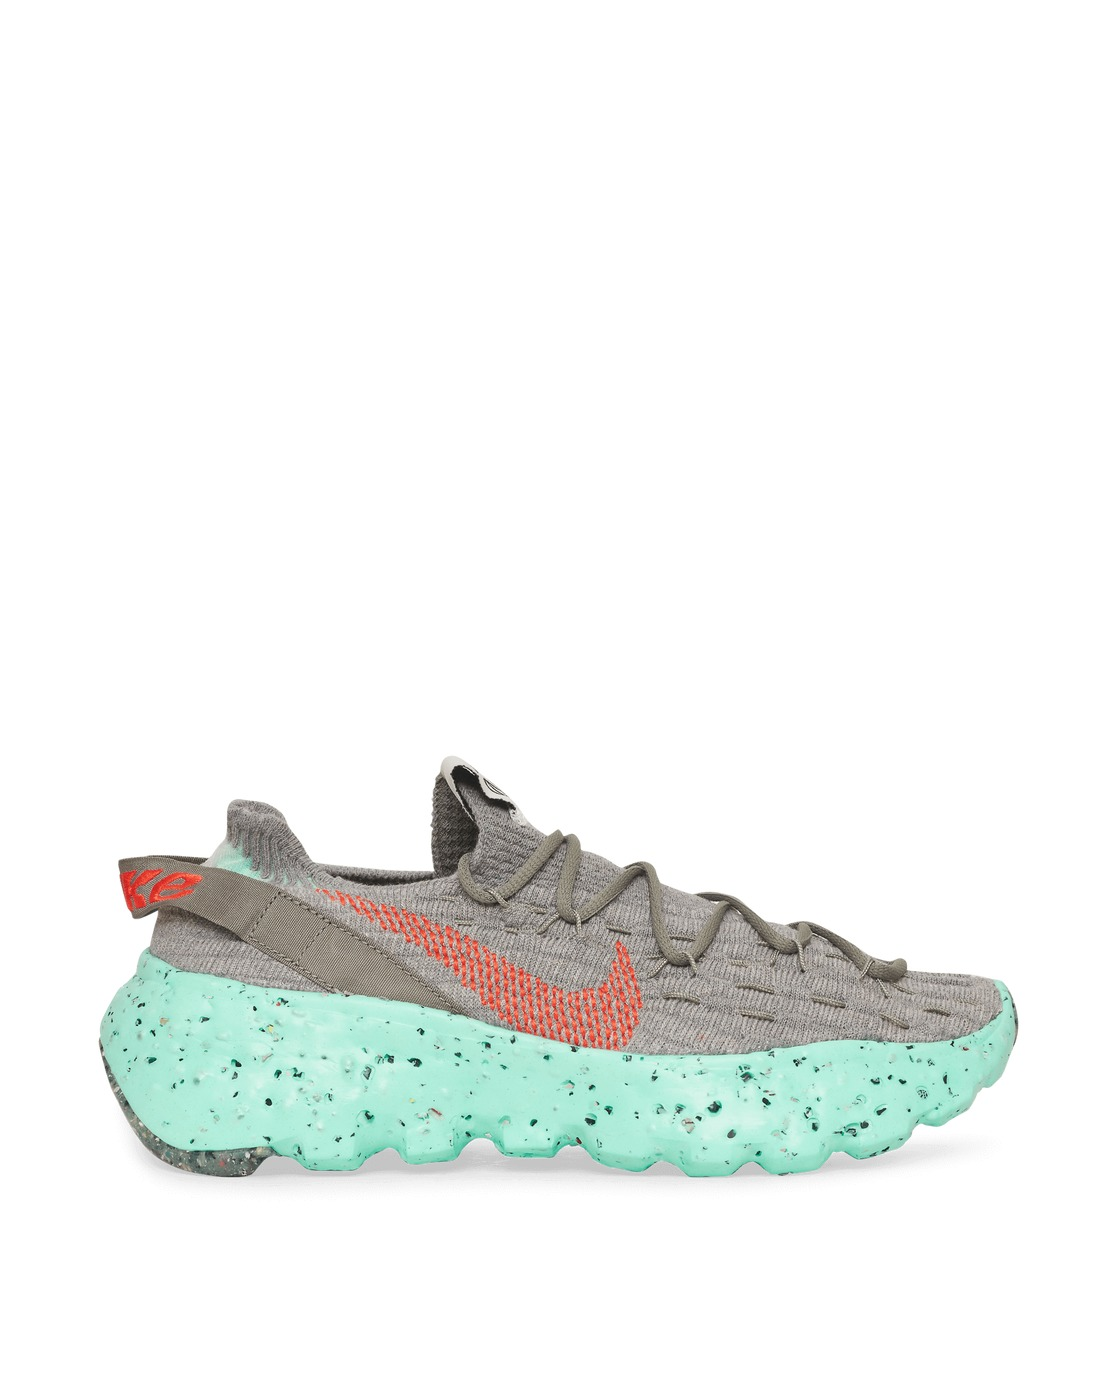 Photo: Nike Space Hippie 04 Sneakers Dark Stucco/Team Orange